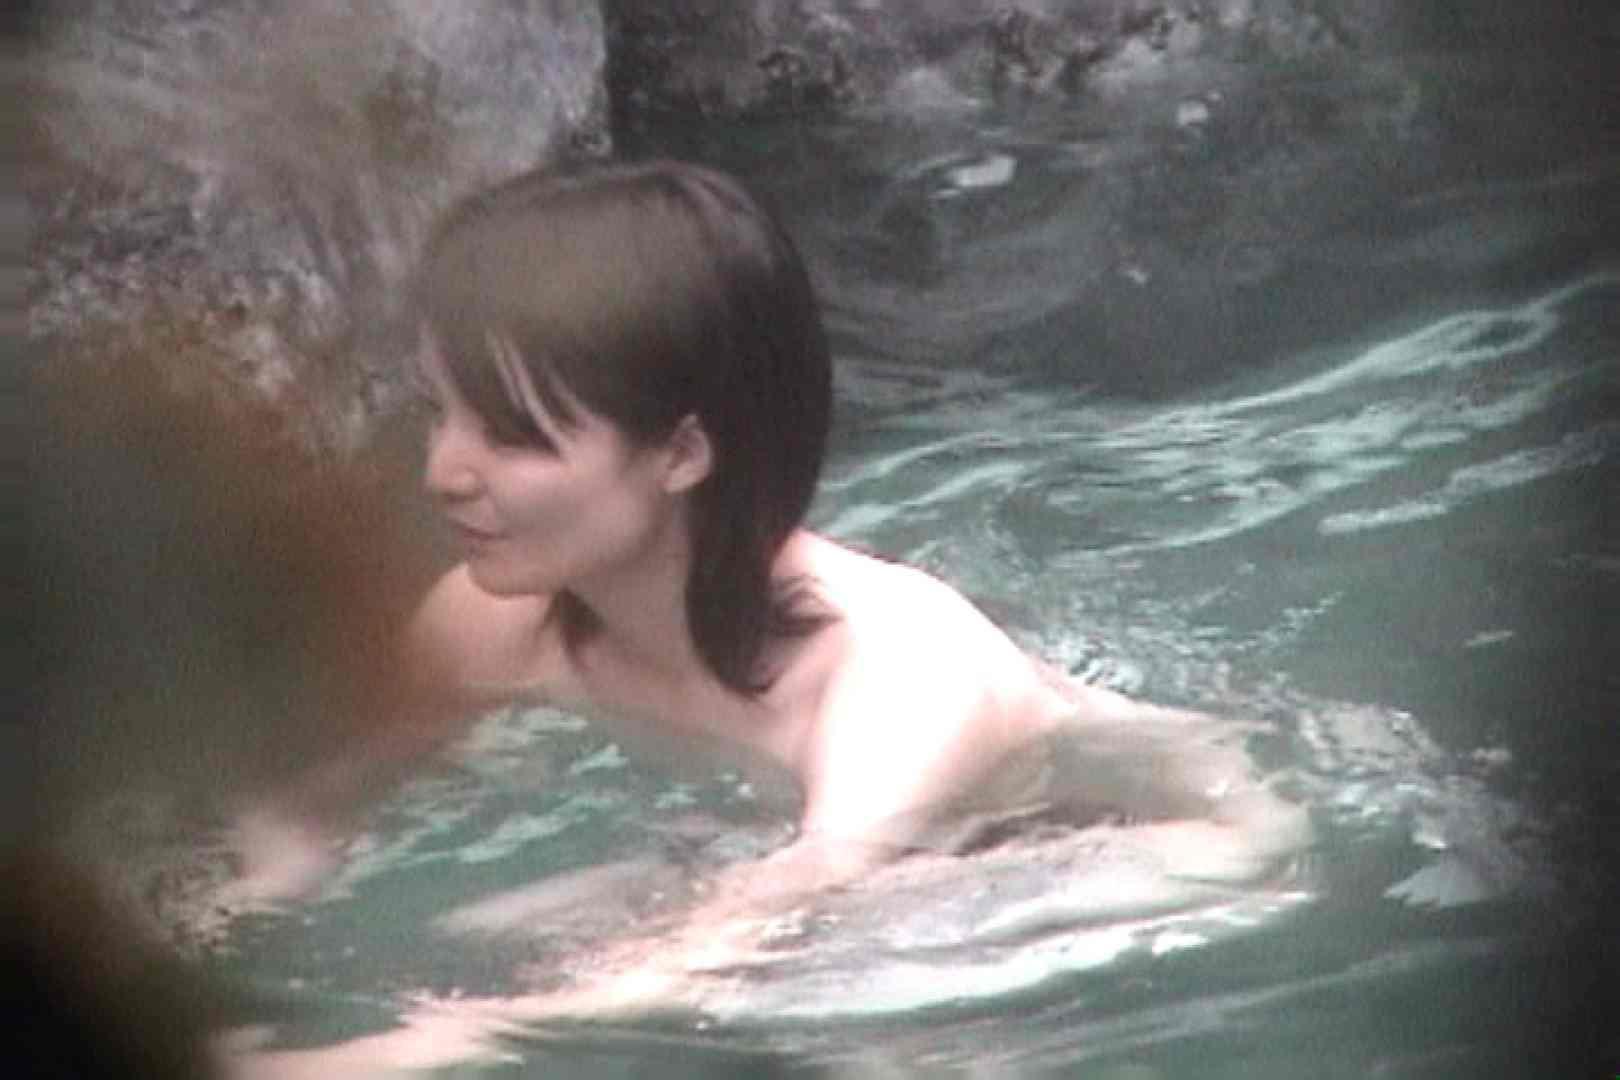 Aquaな露天風呂Vol.71【VIP限定】 盗撮 のぞき動画画像 107画像 71